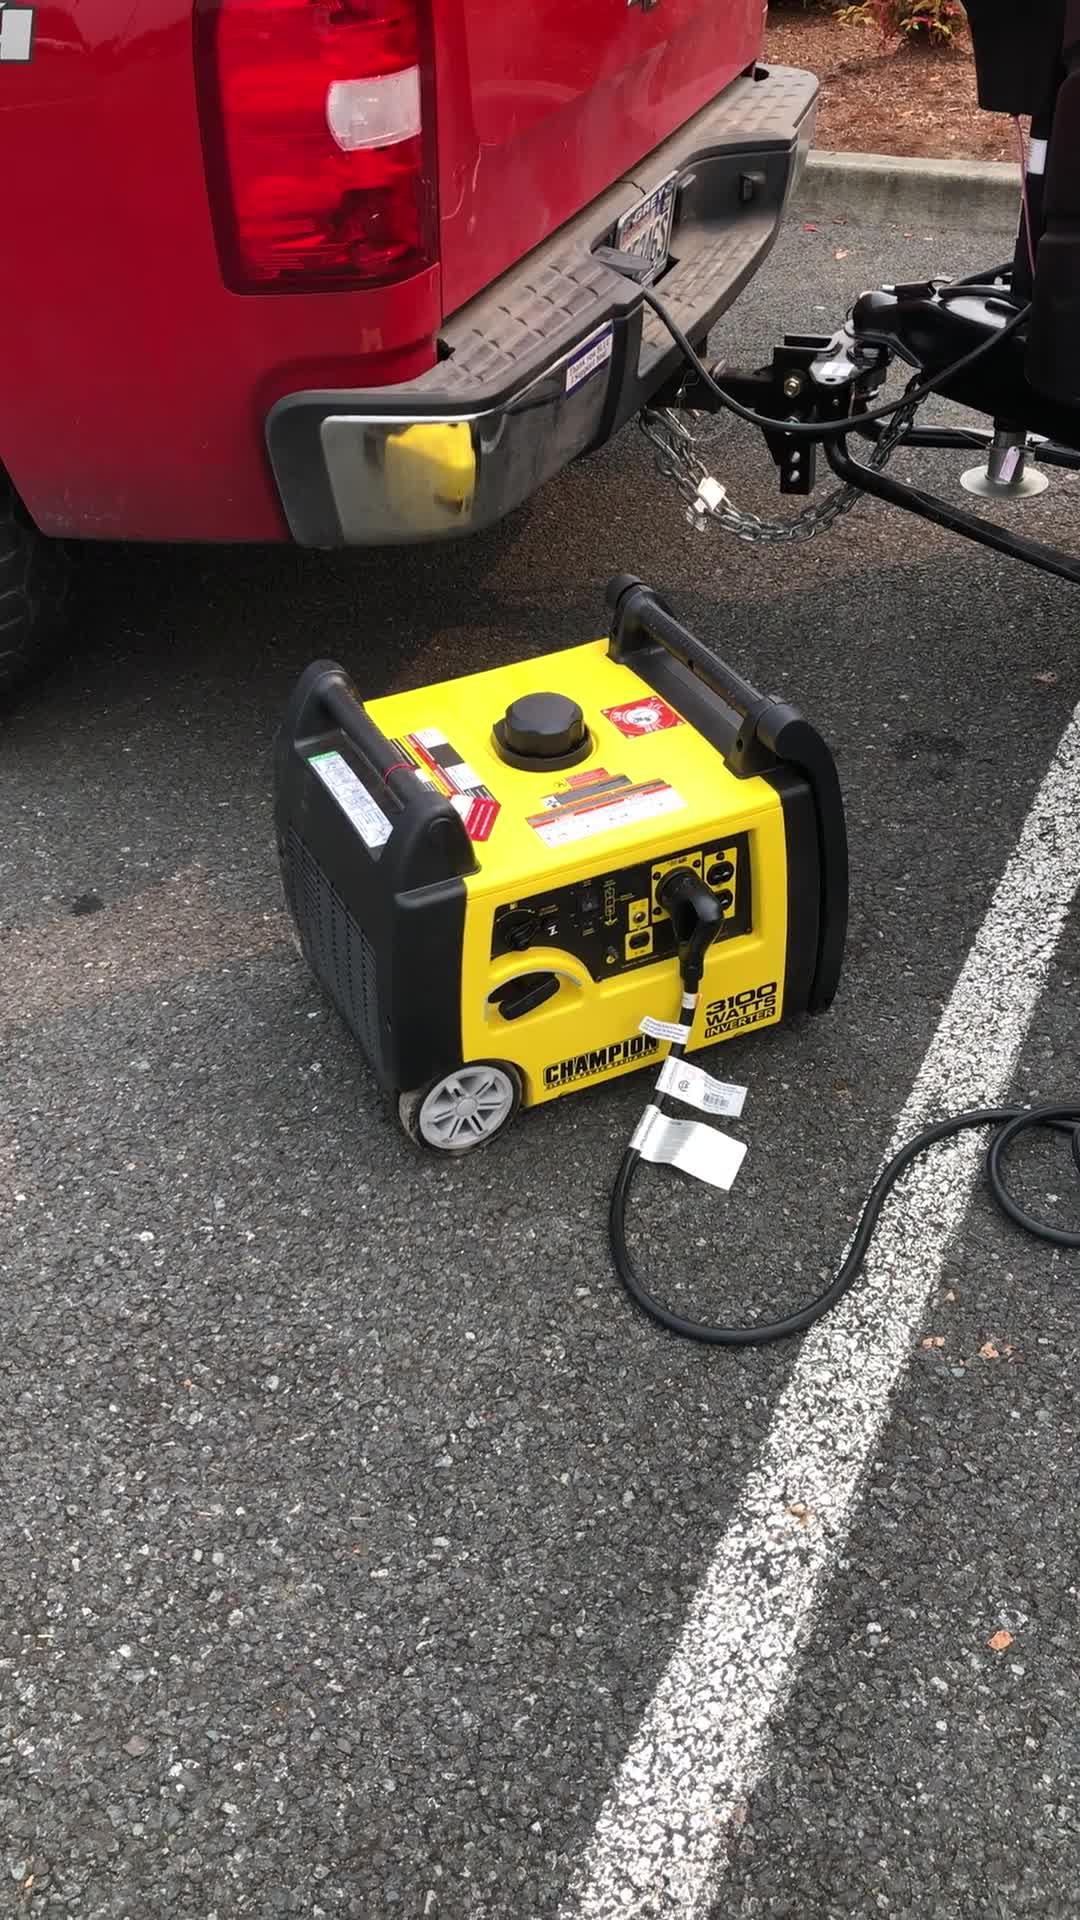 3100 Watt Inverter Generator Champion Power Equipment 4000 Wiring Absolute Using My Microwave In The Cabelas Parking Lot Play